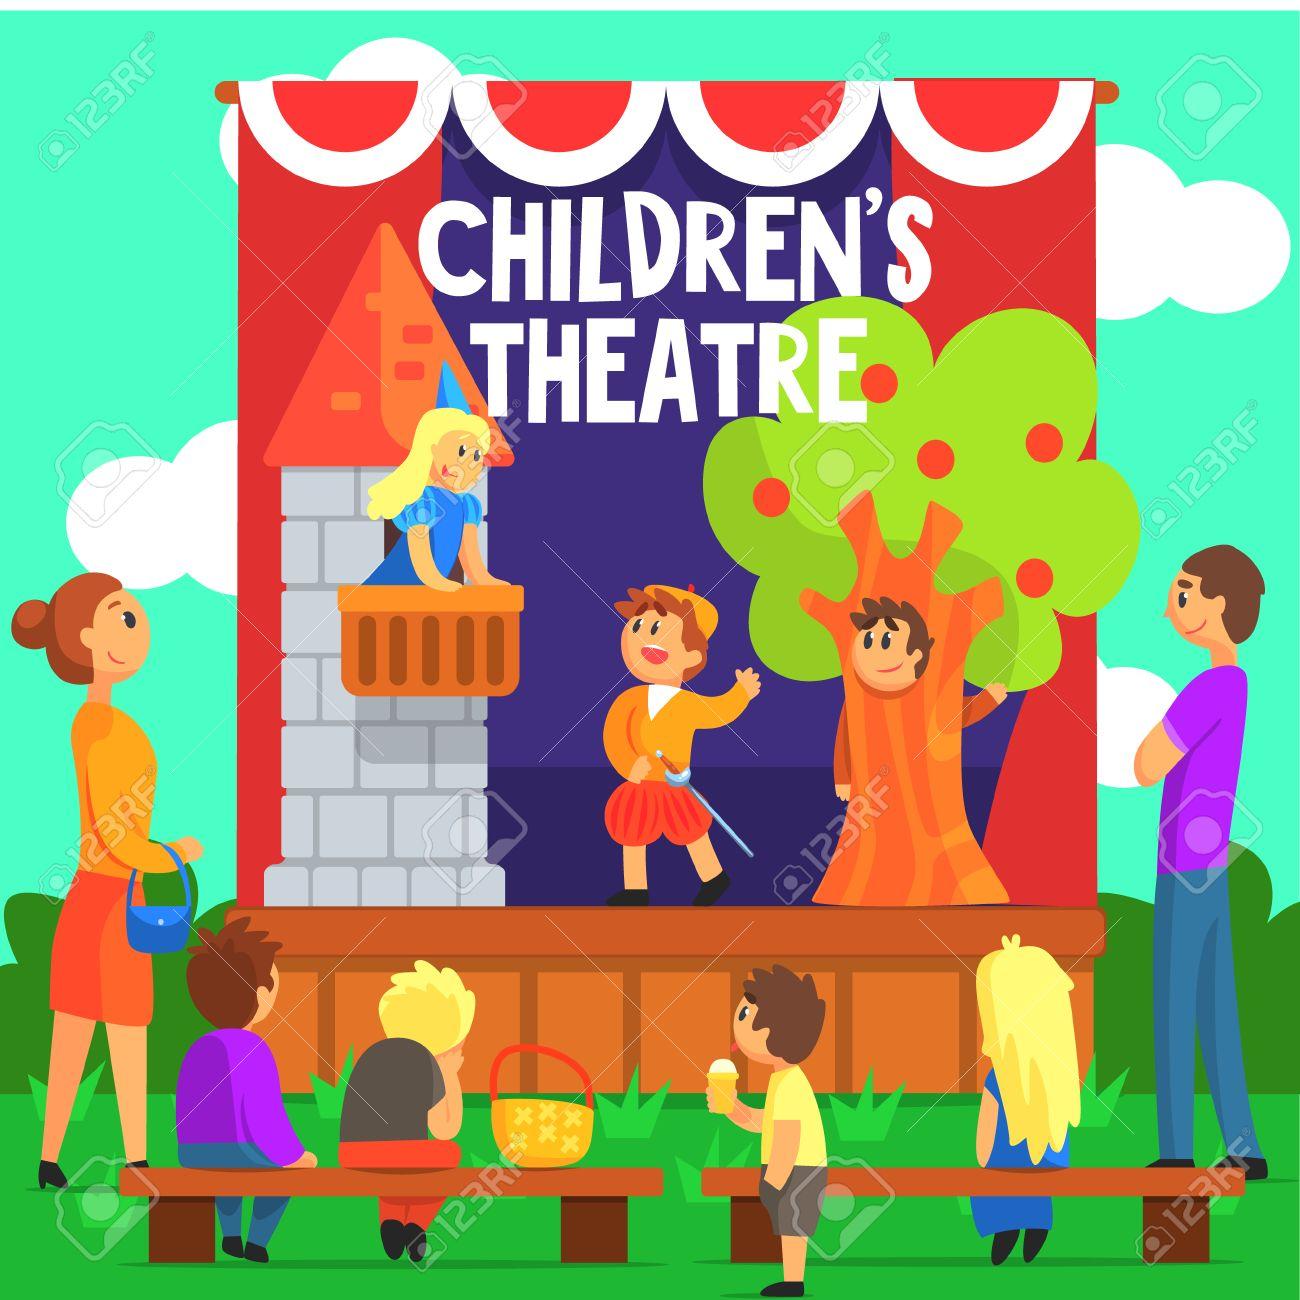 Resultado de imagen de teatro niños dibujo